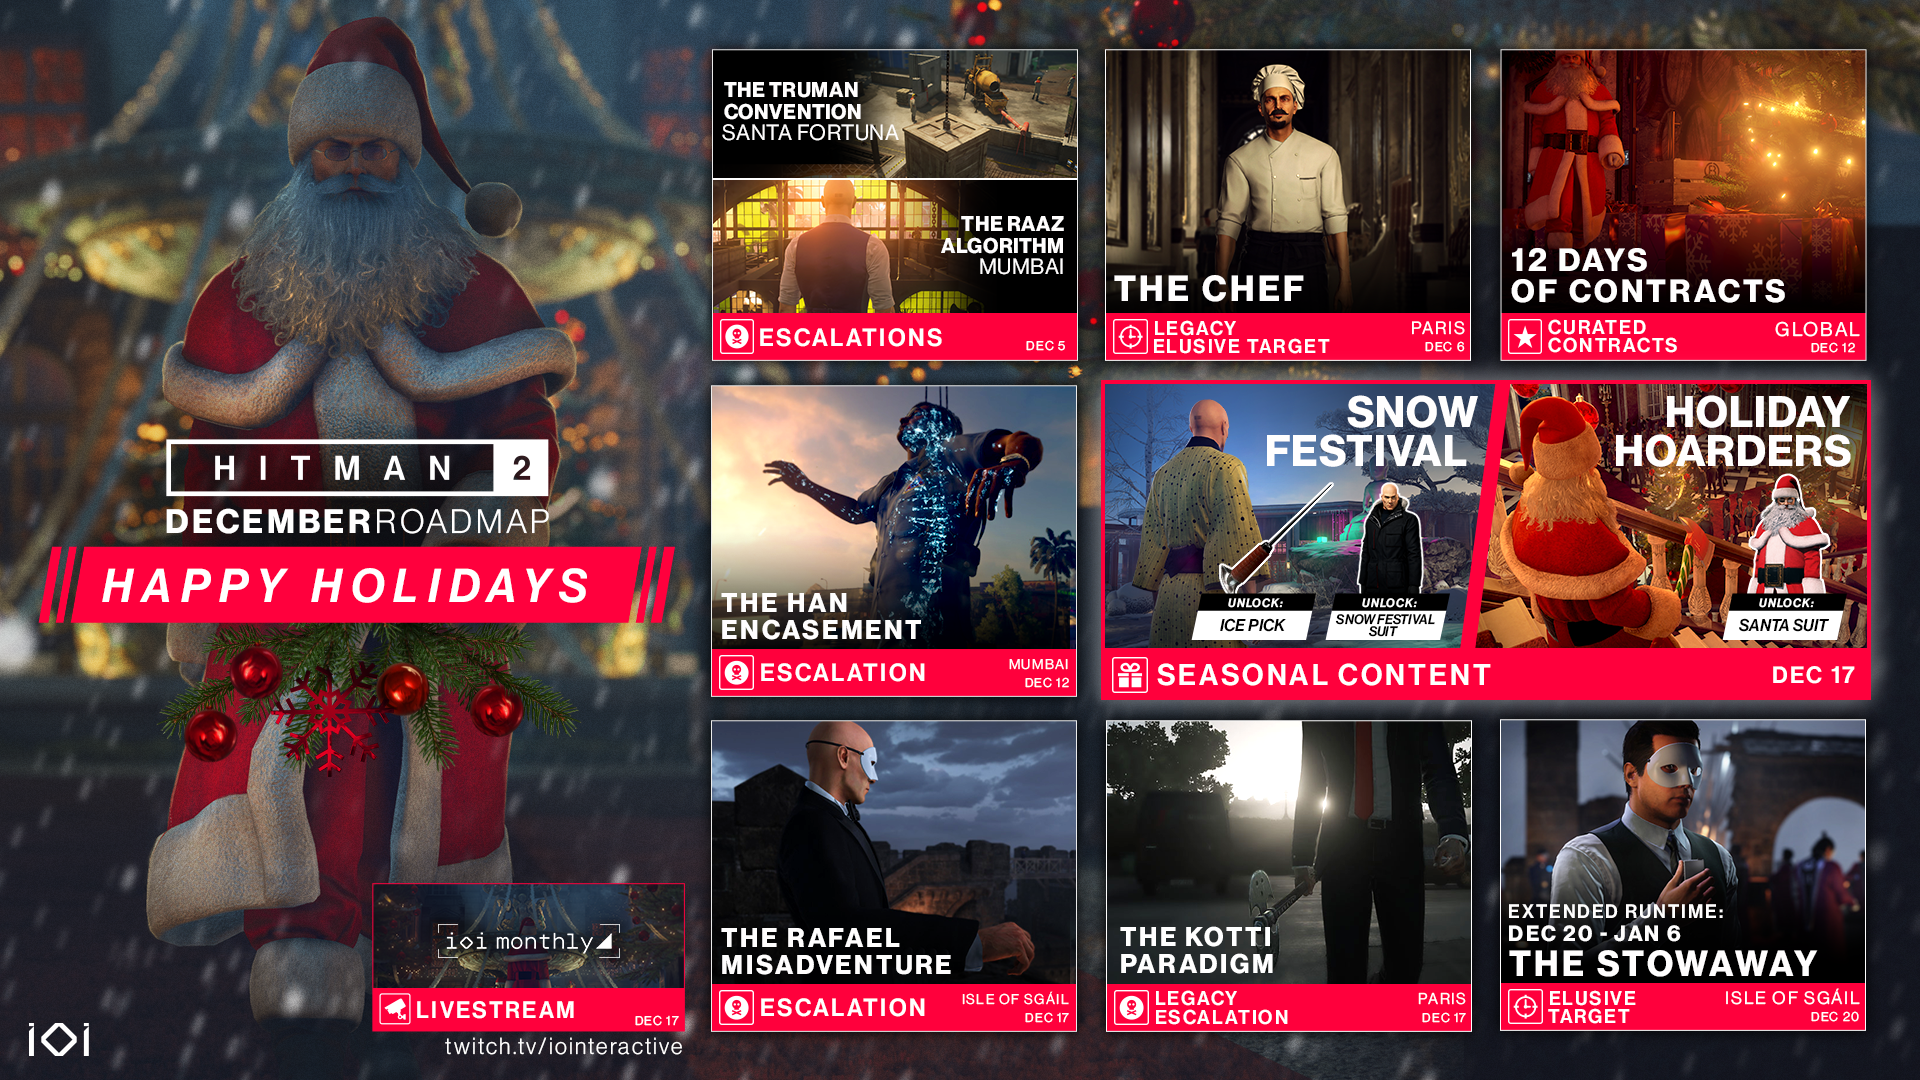 Santa Starts Slaughtering In The Free Hitman 2 December Roadmap